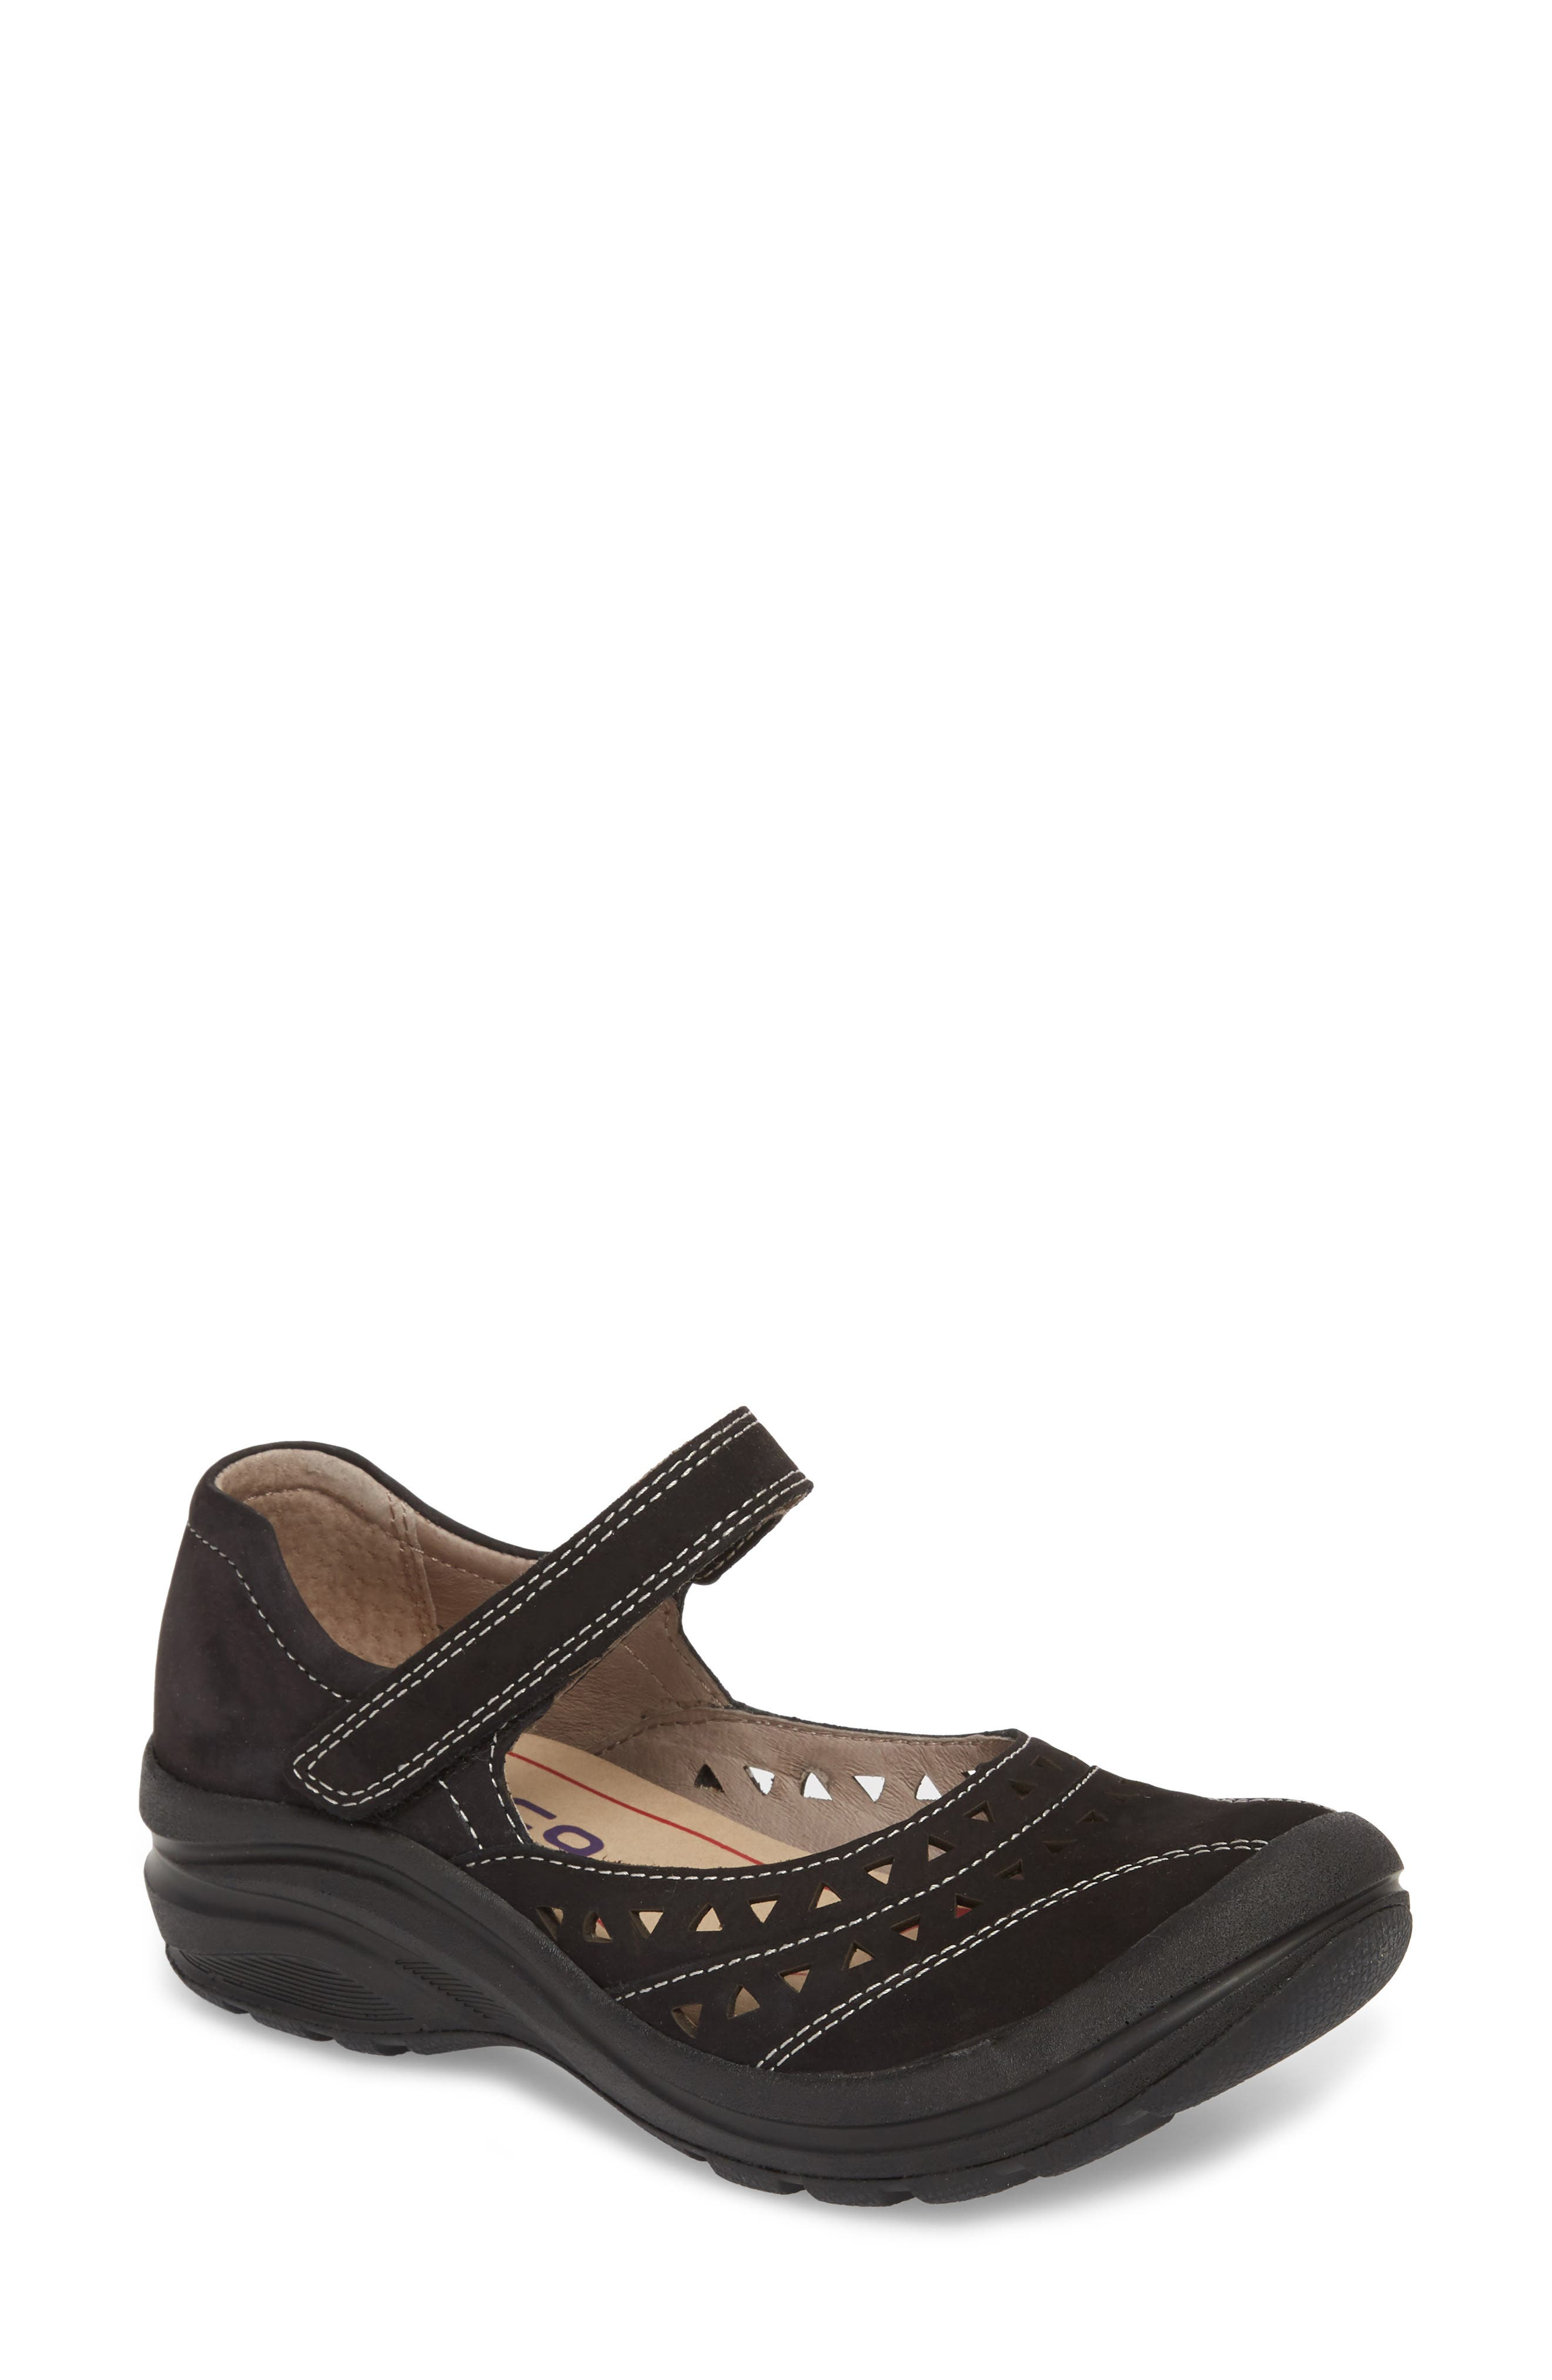 BIONICA Matia Mary Jane Sneaker, Main, color, BLACK LEATHER